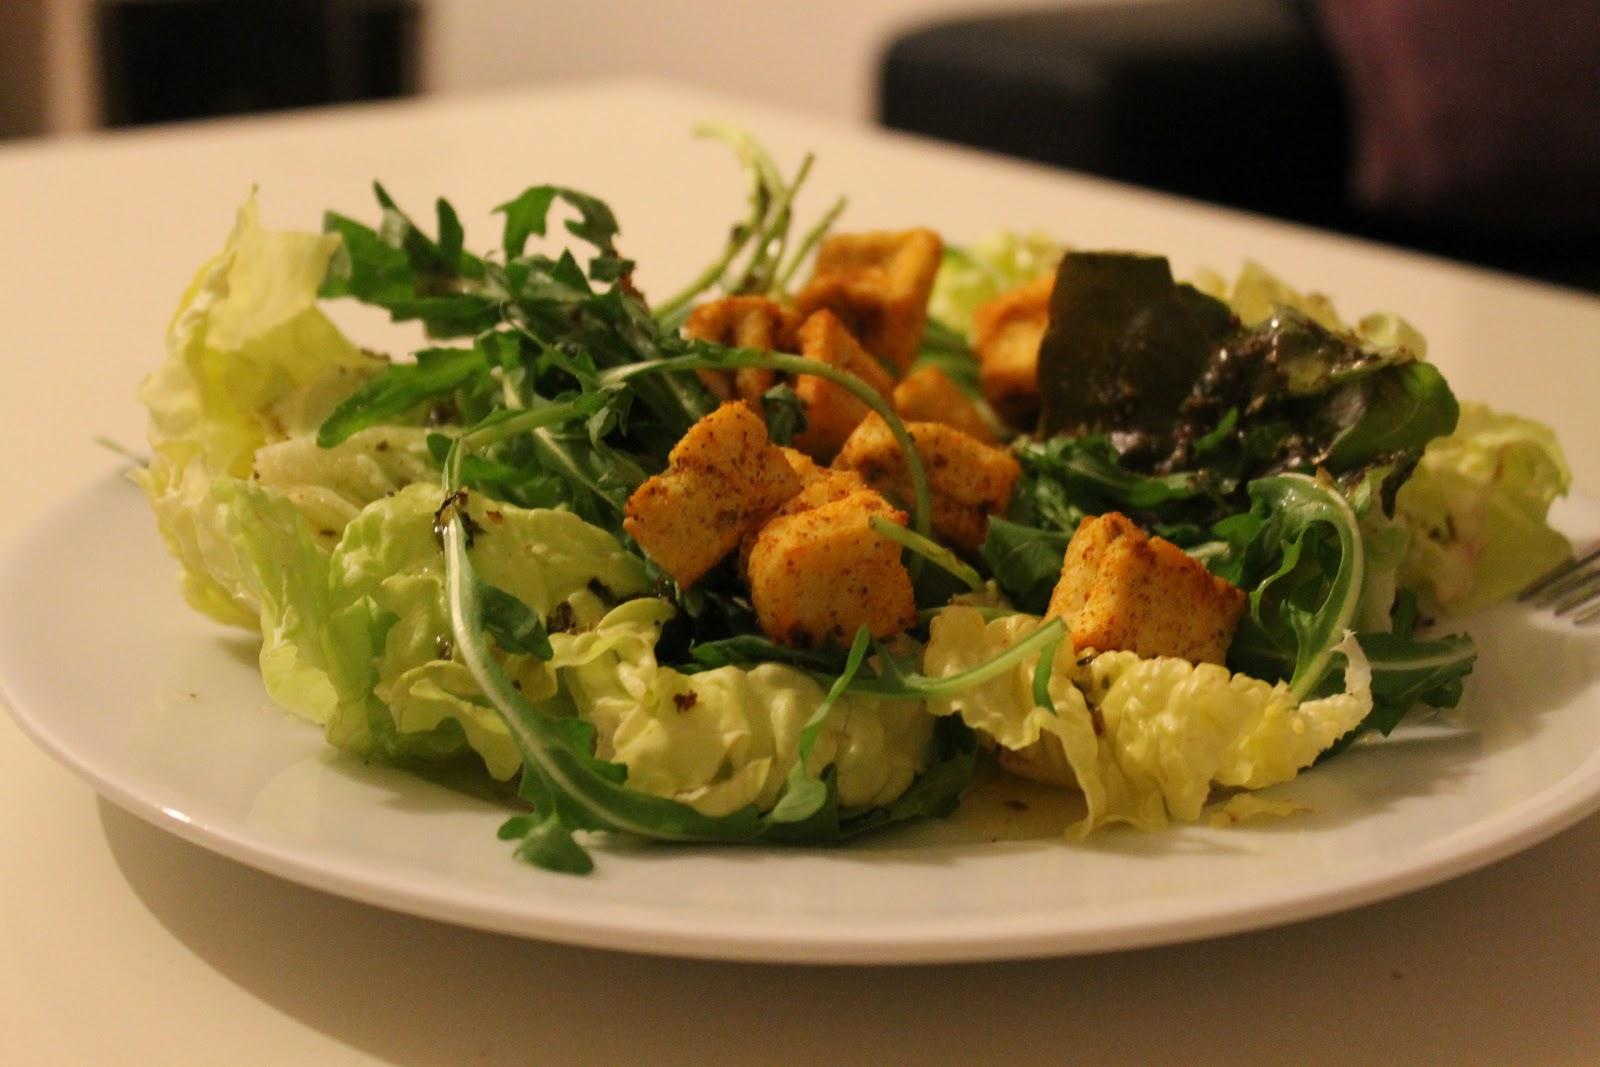 frau saltimbocca l denscheidt salat mit gepufftem tofu. Black Bedroom Furniture Sets. Home Design Ideas